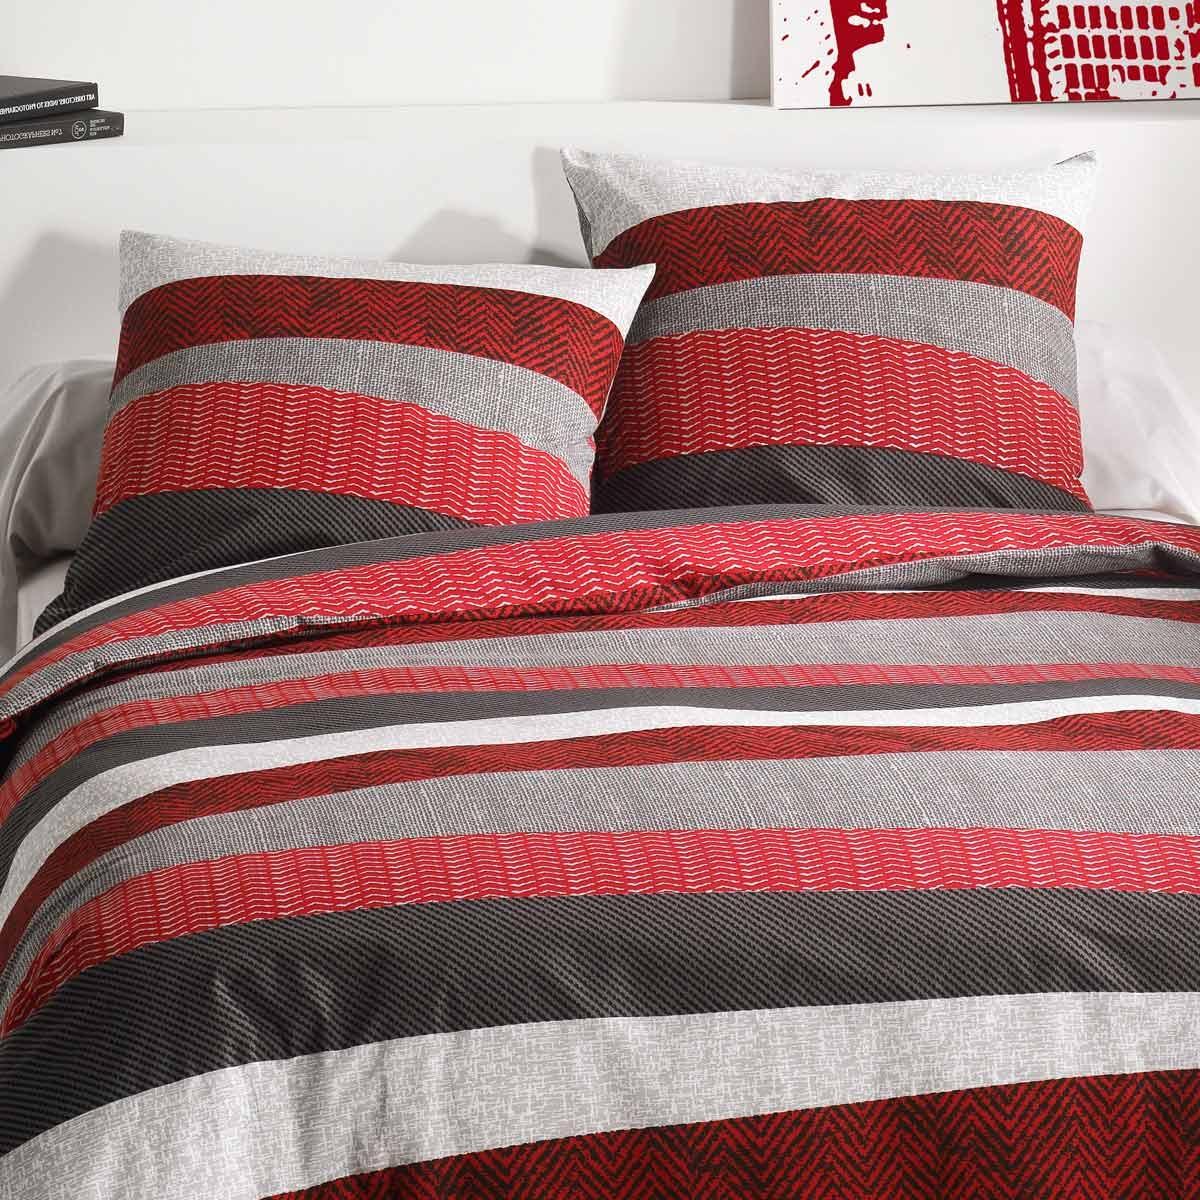 housse de couette taie tribeca rouge c design home ebay. Black Bedroom Furniture Sets. Home Design Ideas